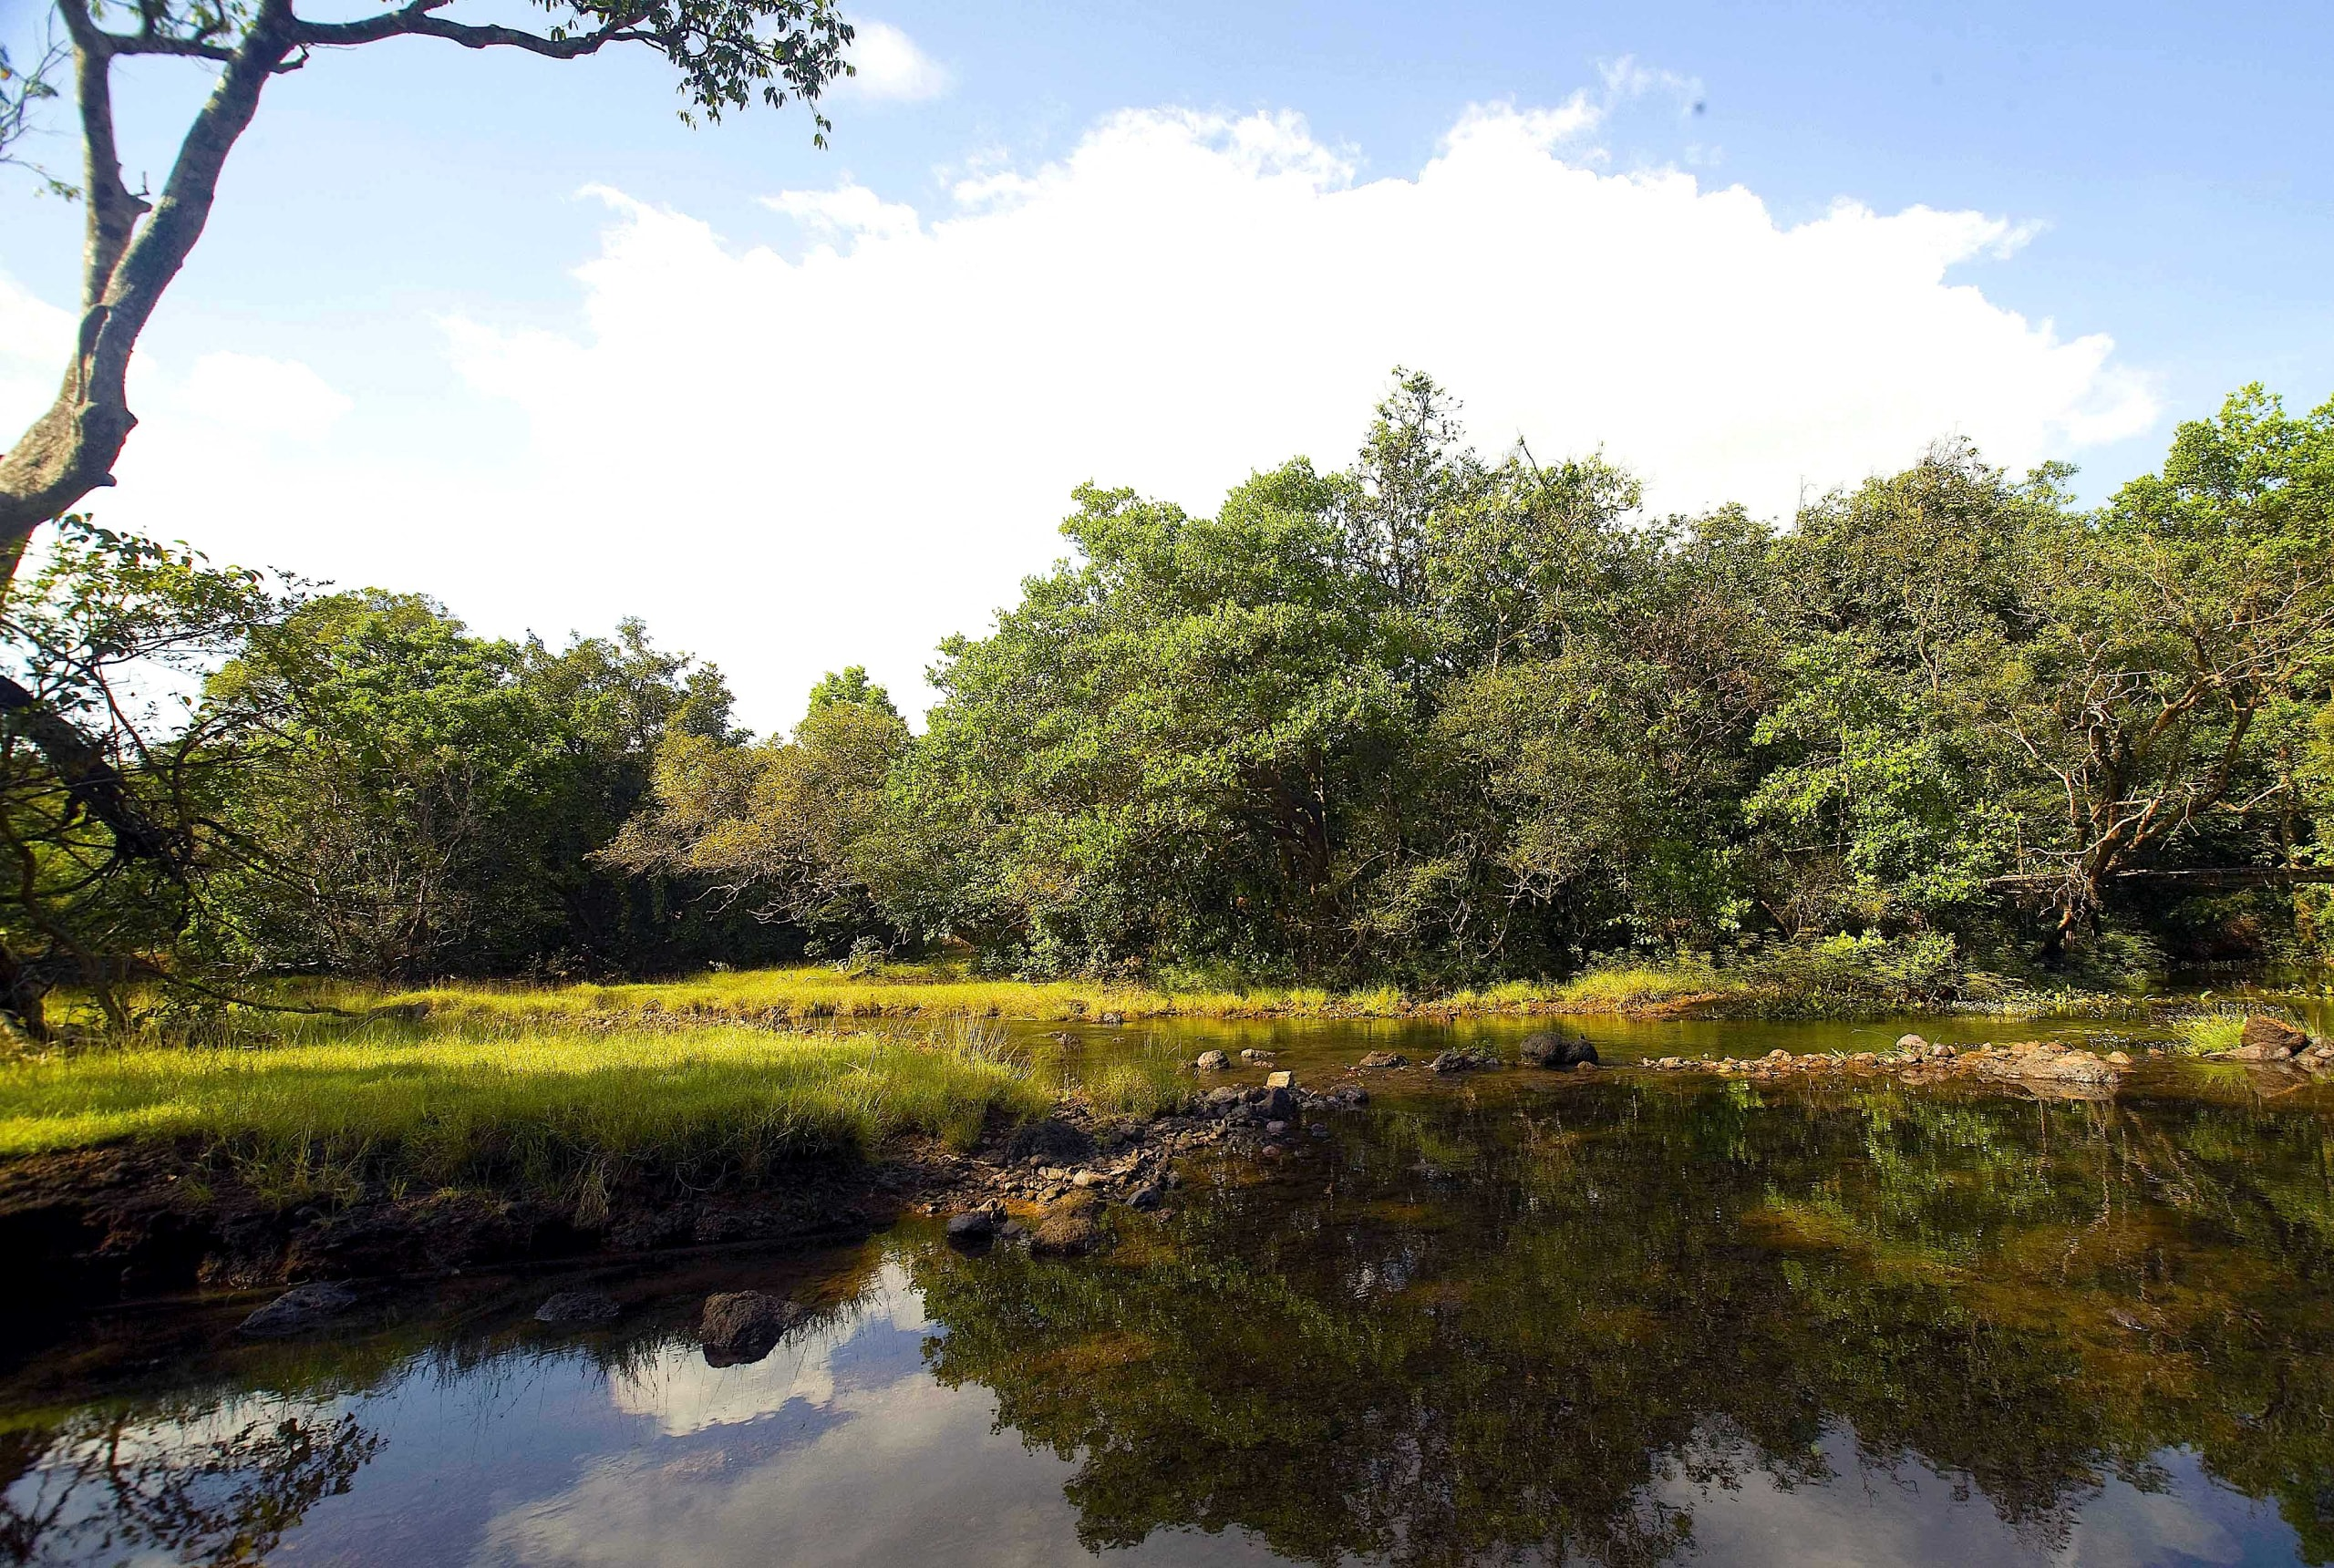 The Dudhsagar River flows through the densely vegetated Kali Tiger Reserve in Karnataka, sustaining wildlife along the way.